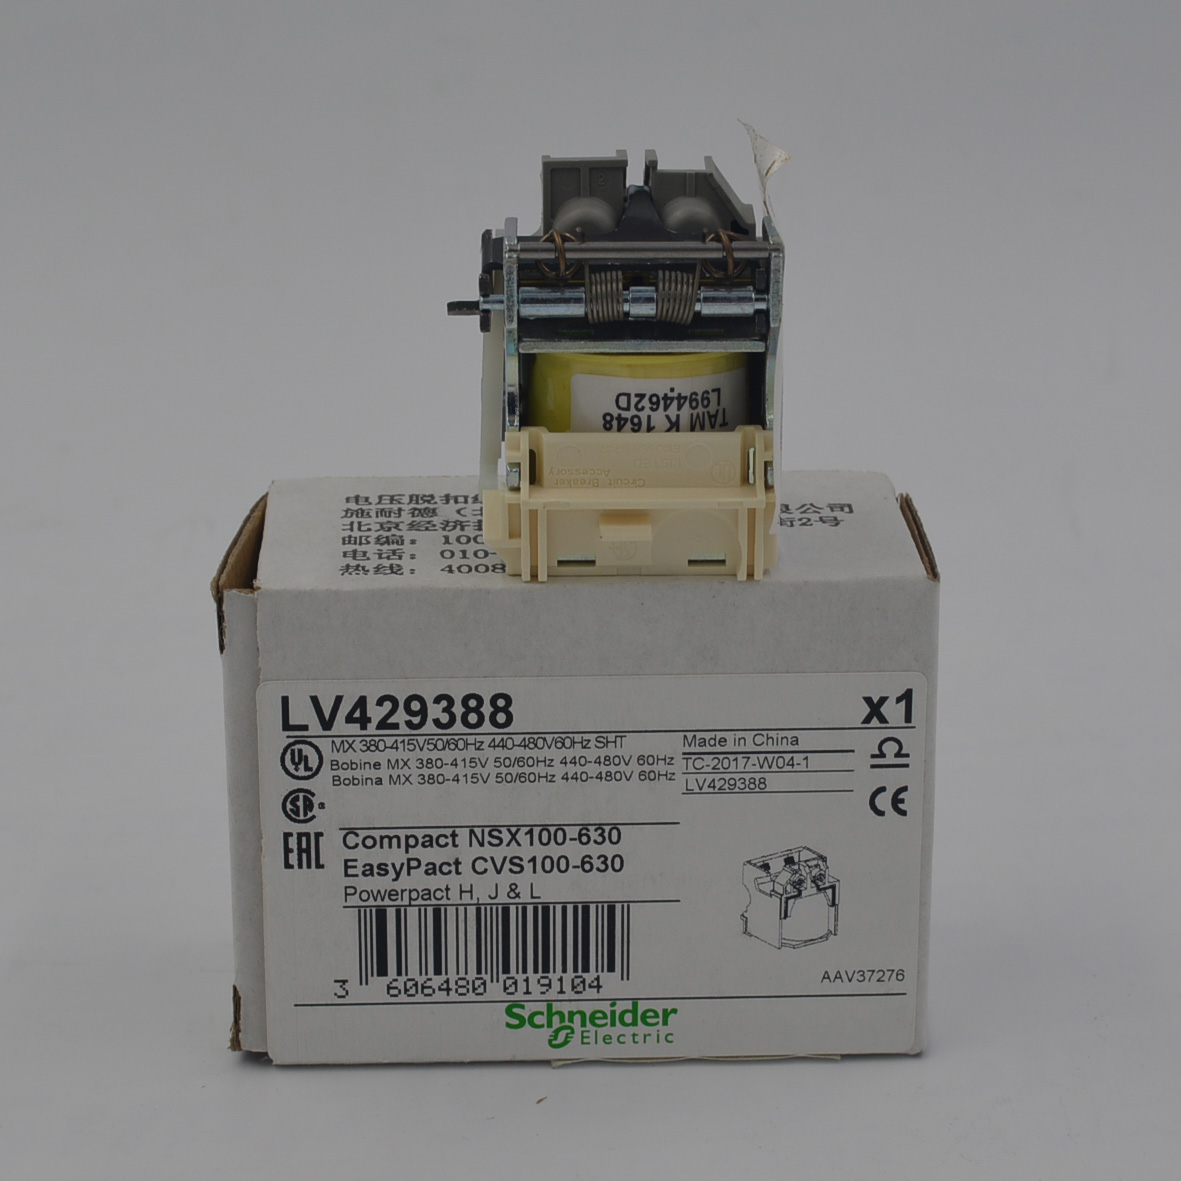 LV429388